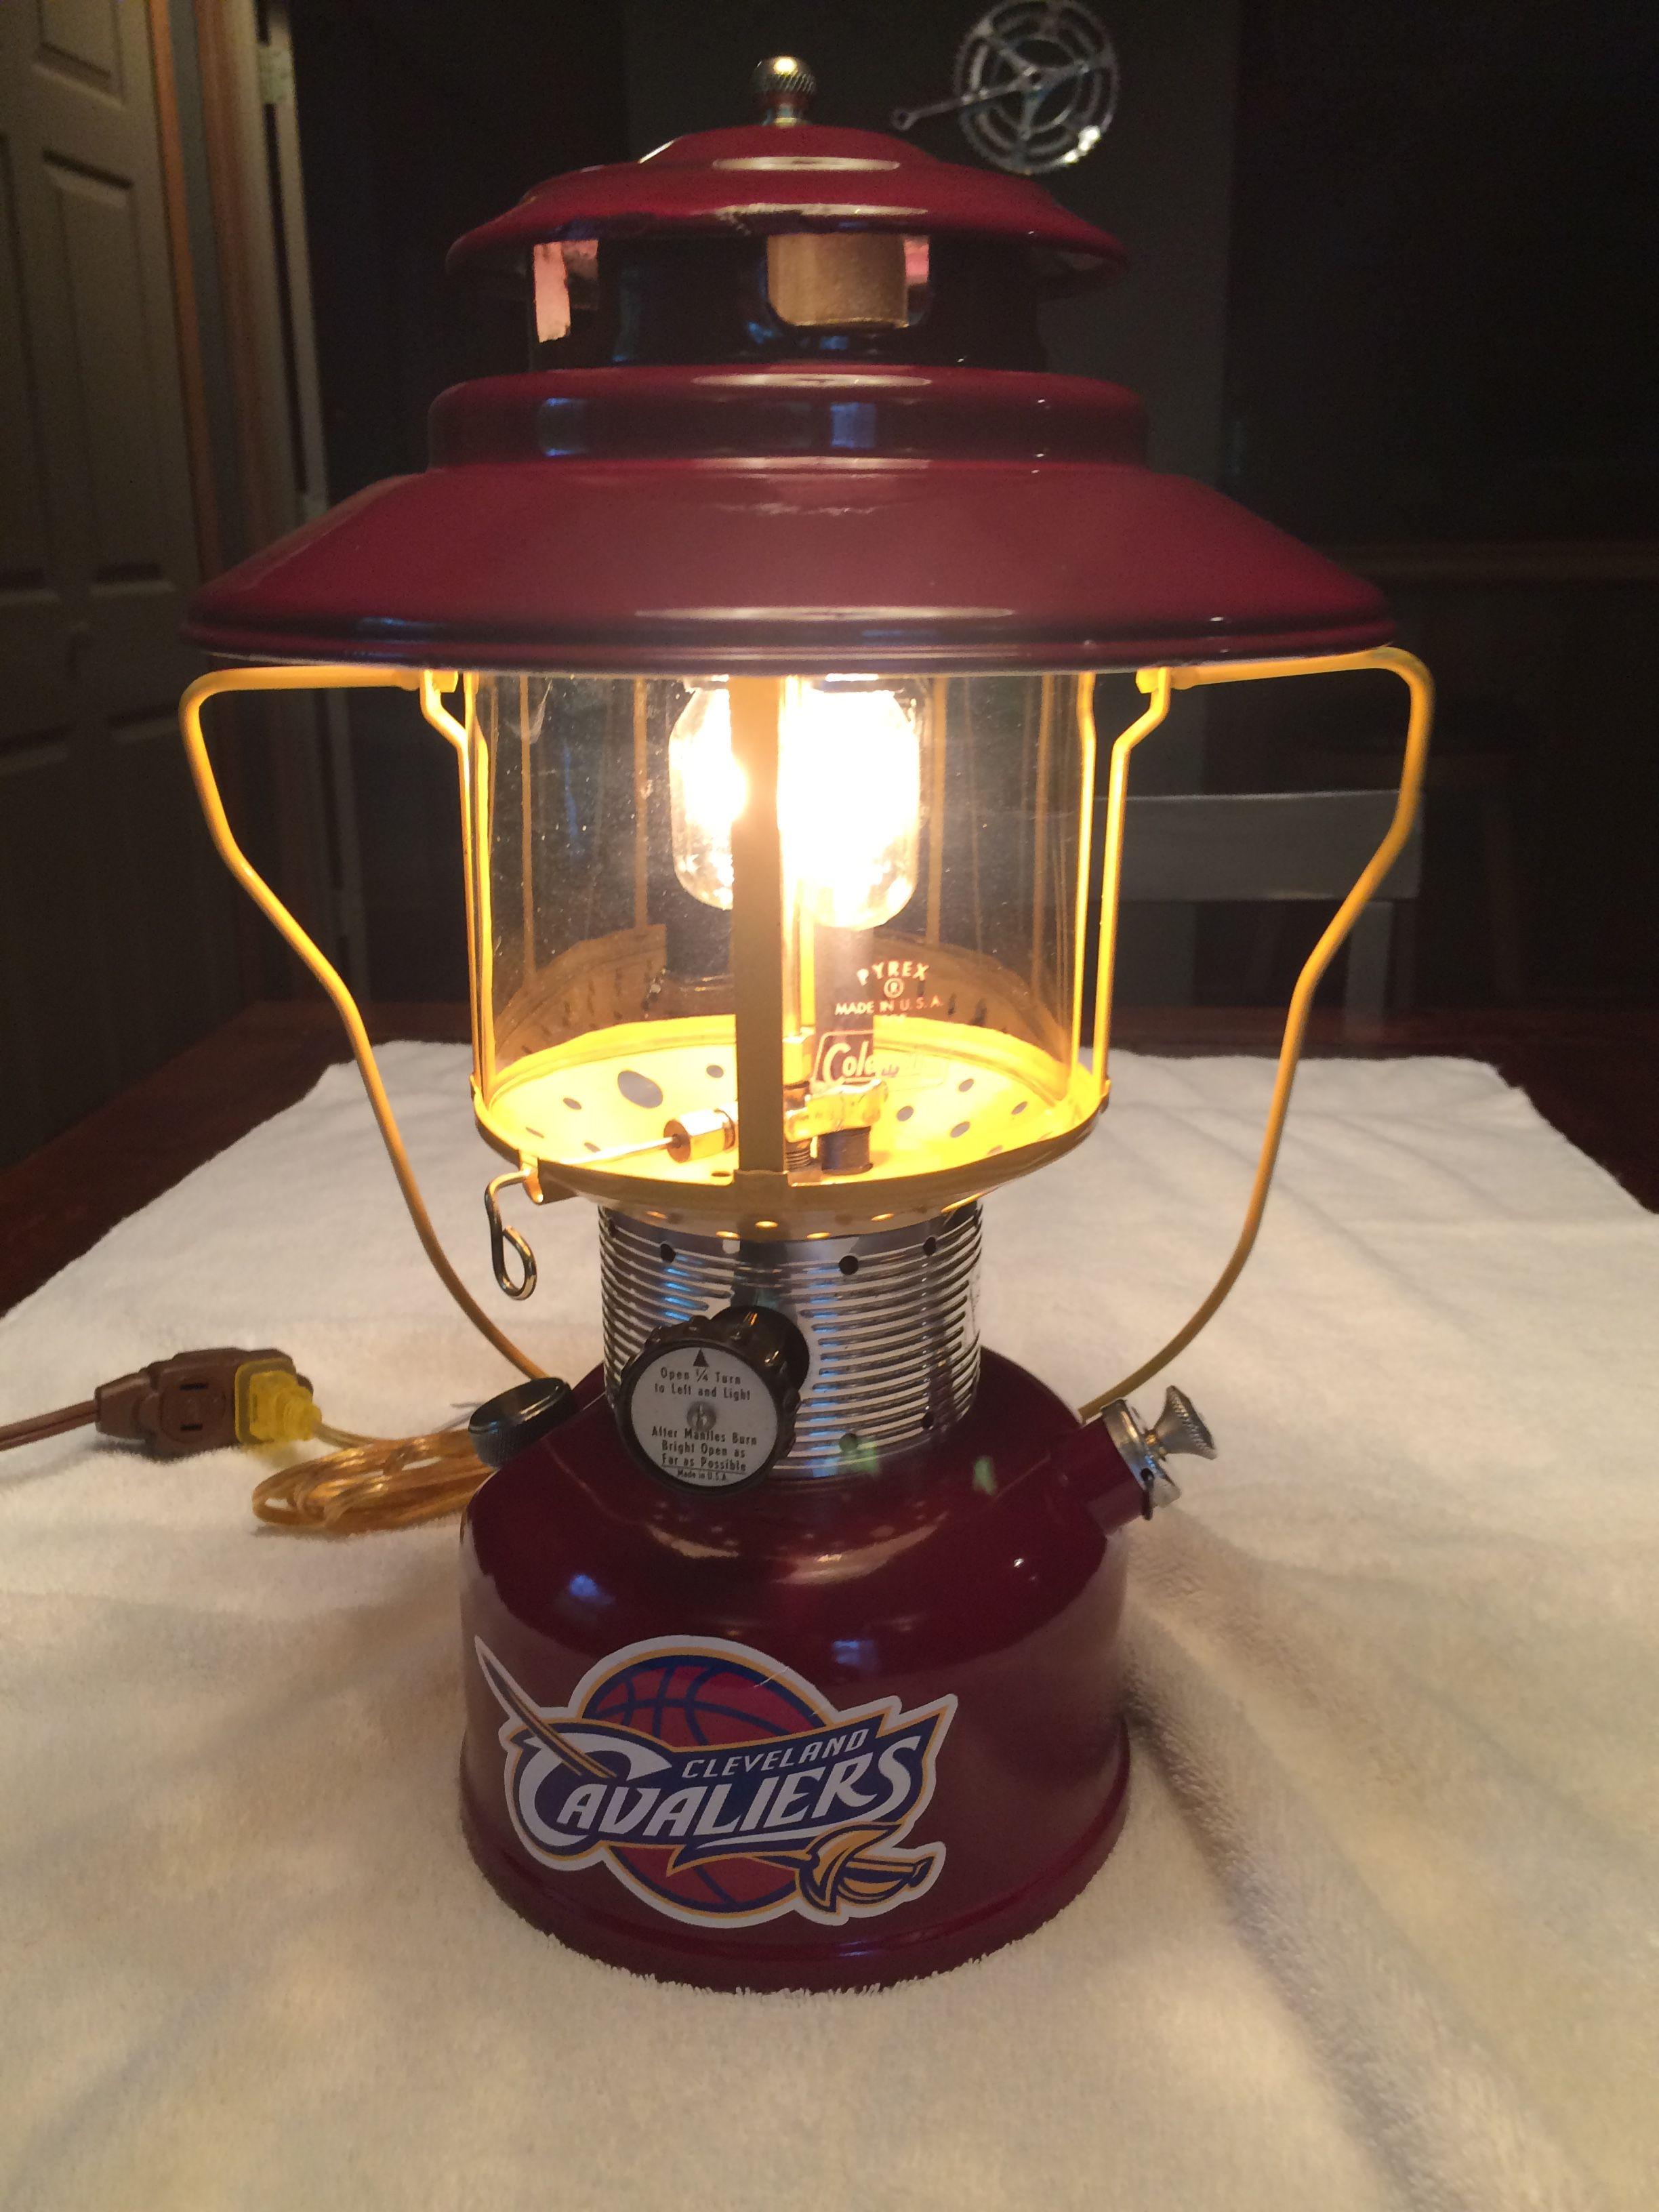 Pin By Bill Flecher On Repurposed Coleman Lantern Gas Lanterns Oil Lamps Diy Lamp